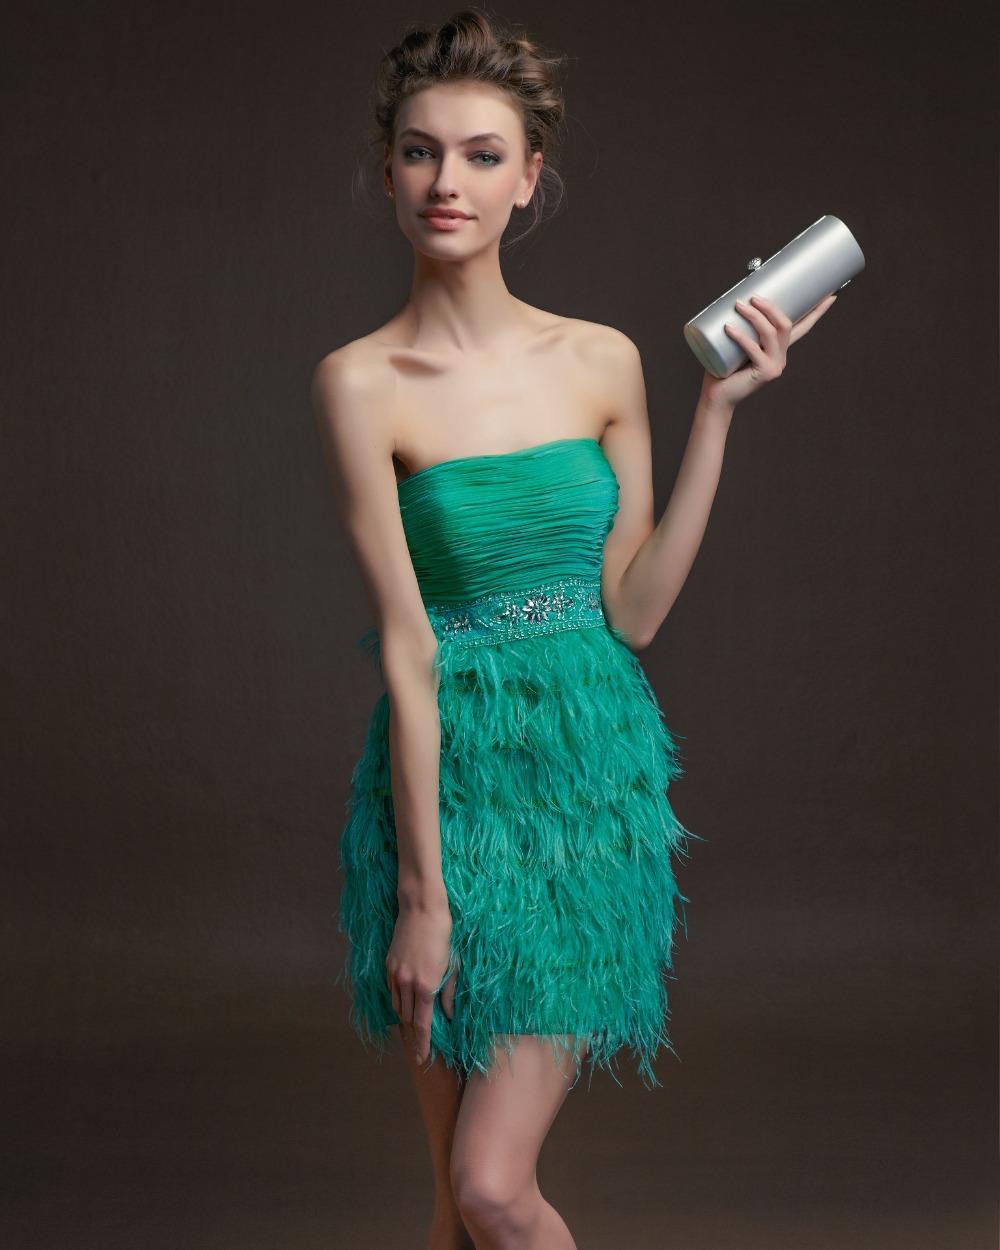 Elegant Strapless Sea Green Mini Cocktail Dresses 2016 Beaded Waist Ostrich Feather Short Party Gown Vestido Fiesta Renda(China (Mainland))